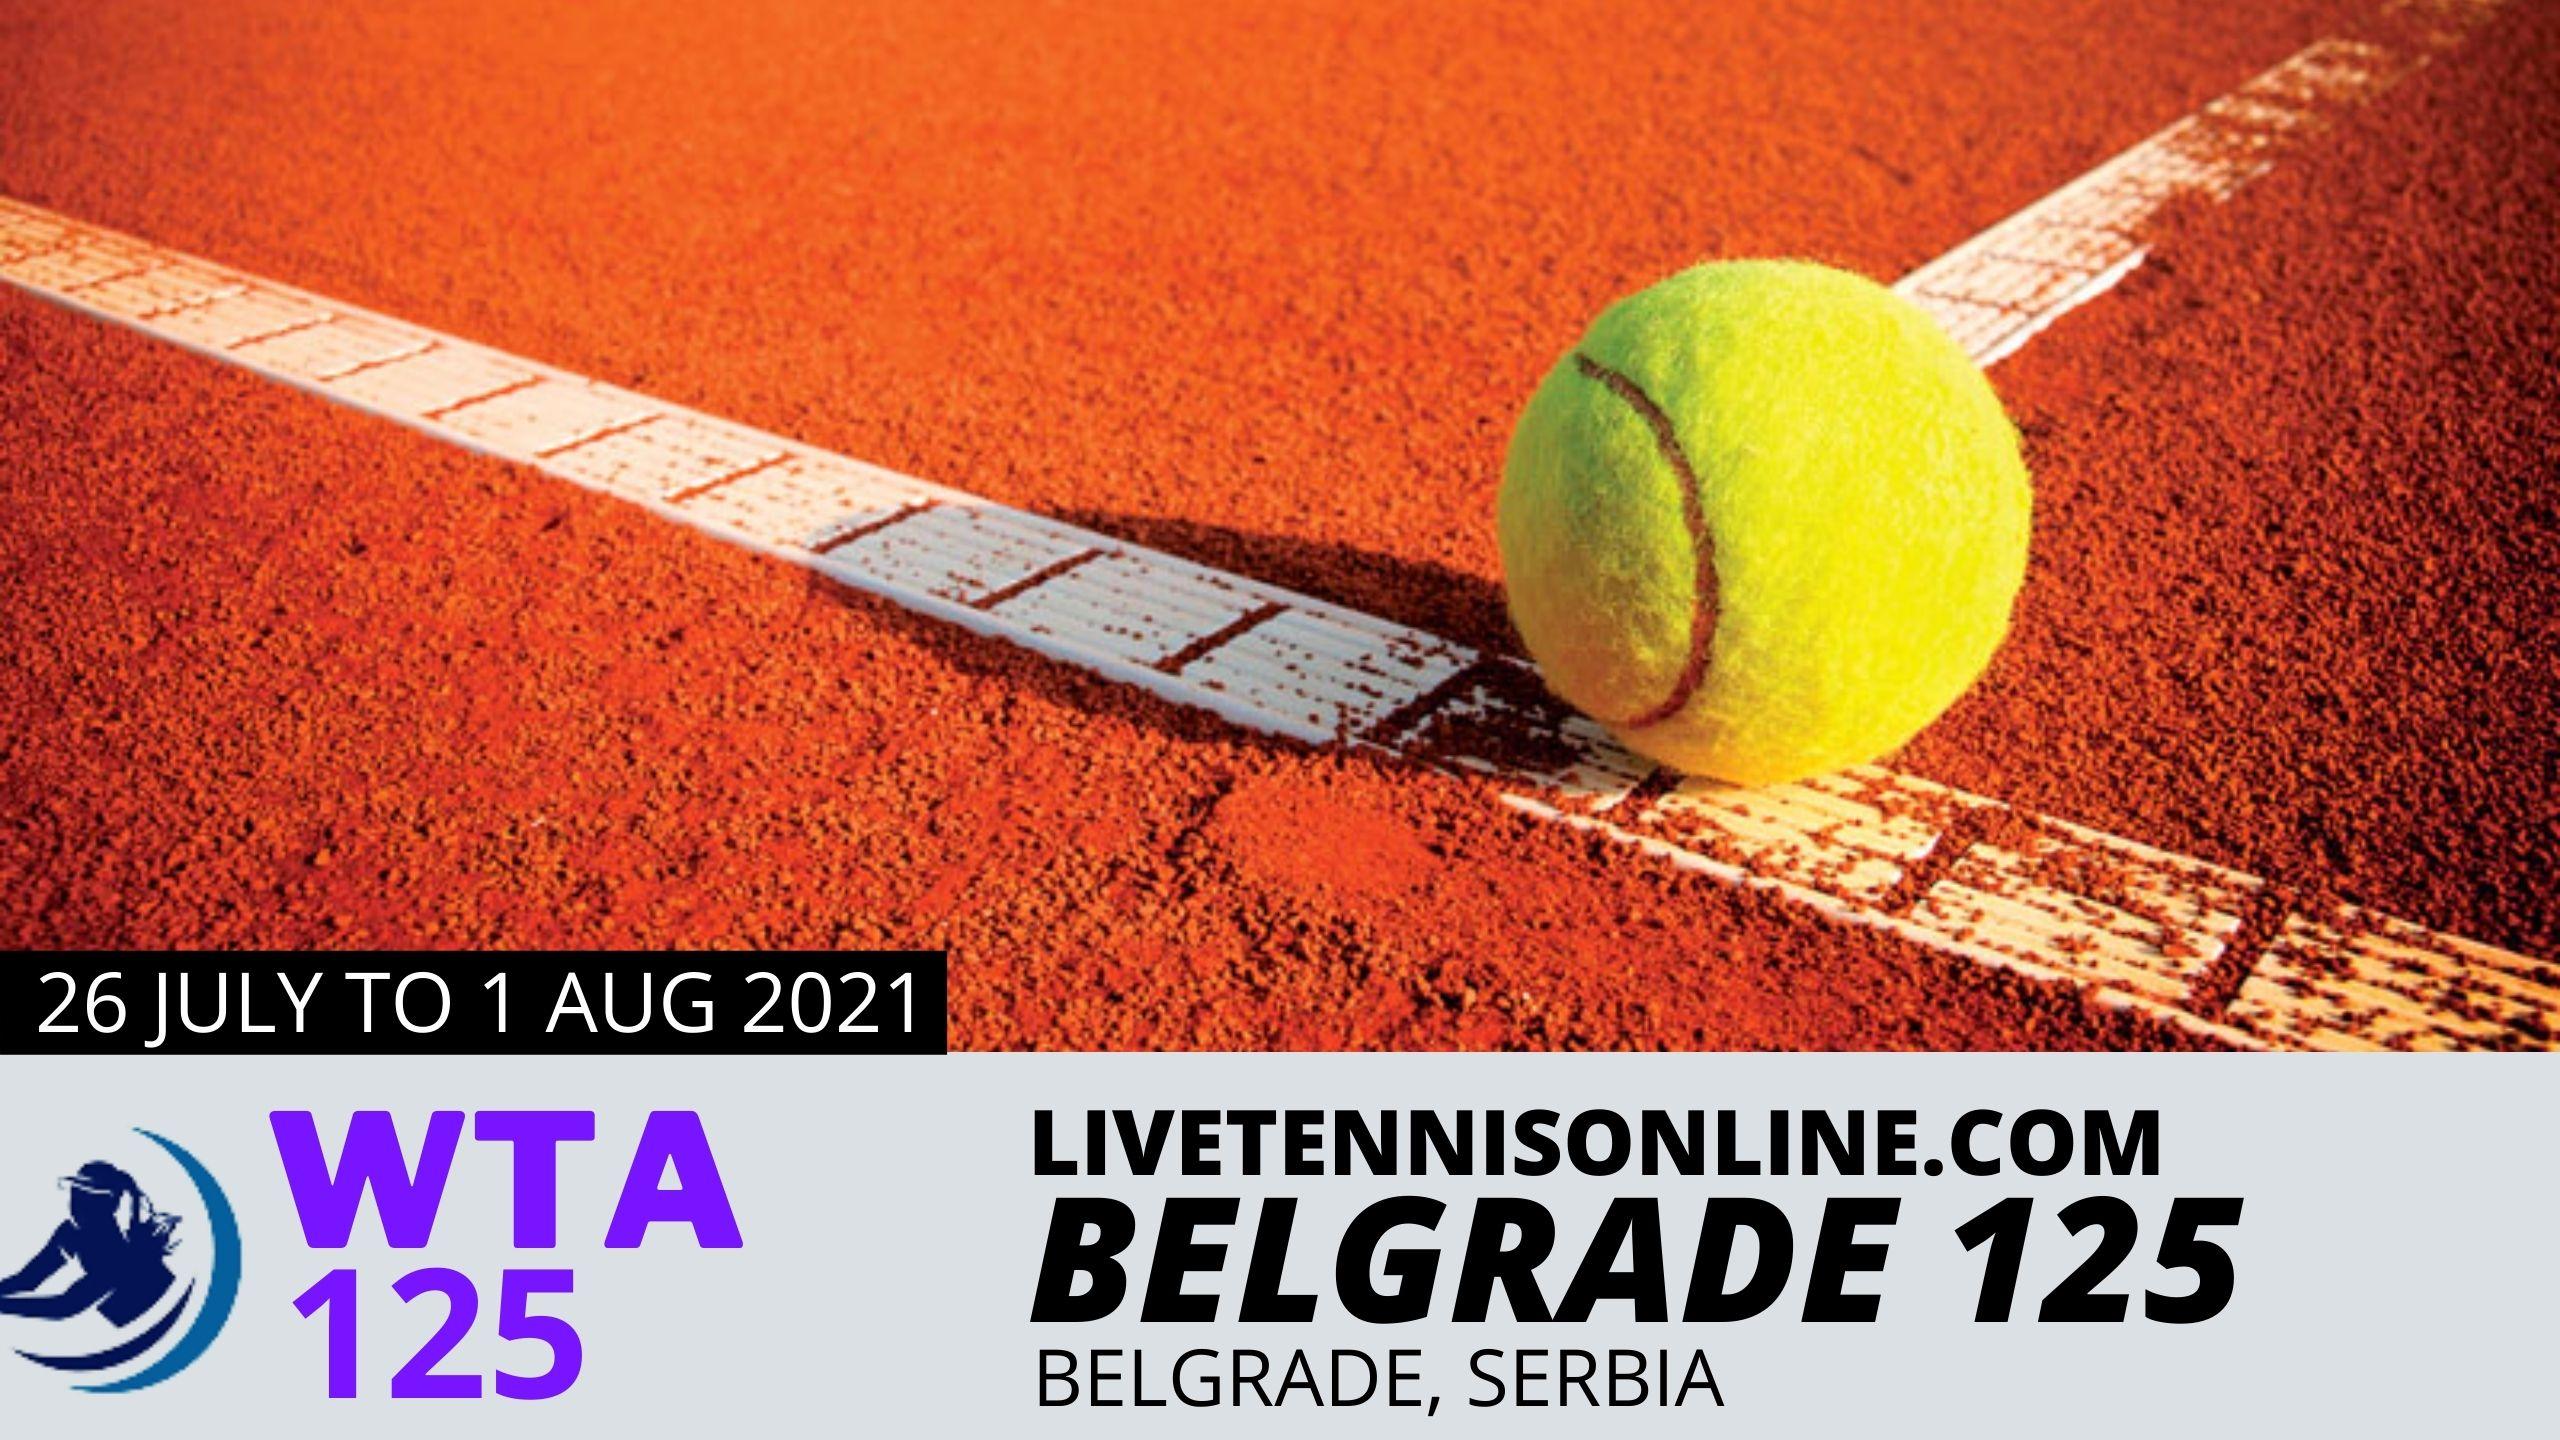 WTA Belgrade Ladies Open Live Stream